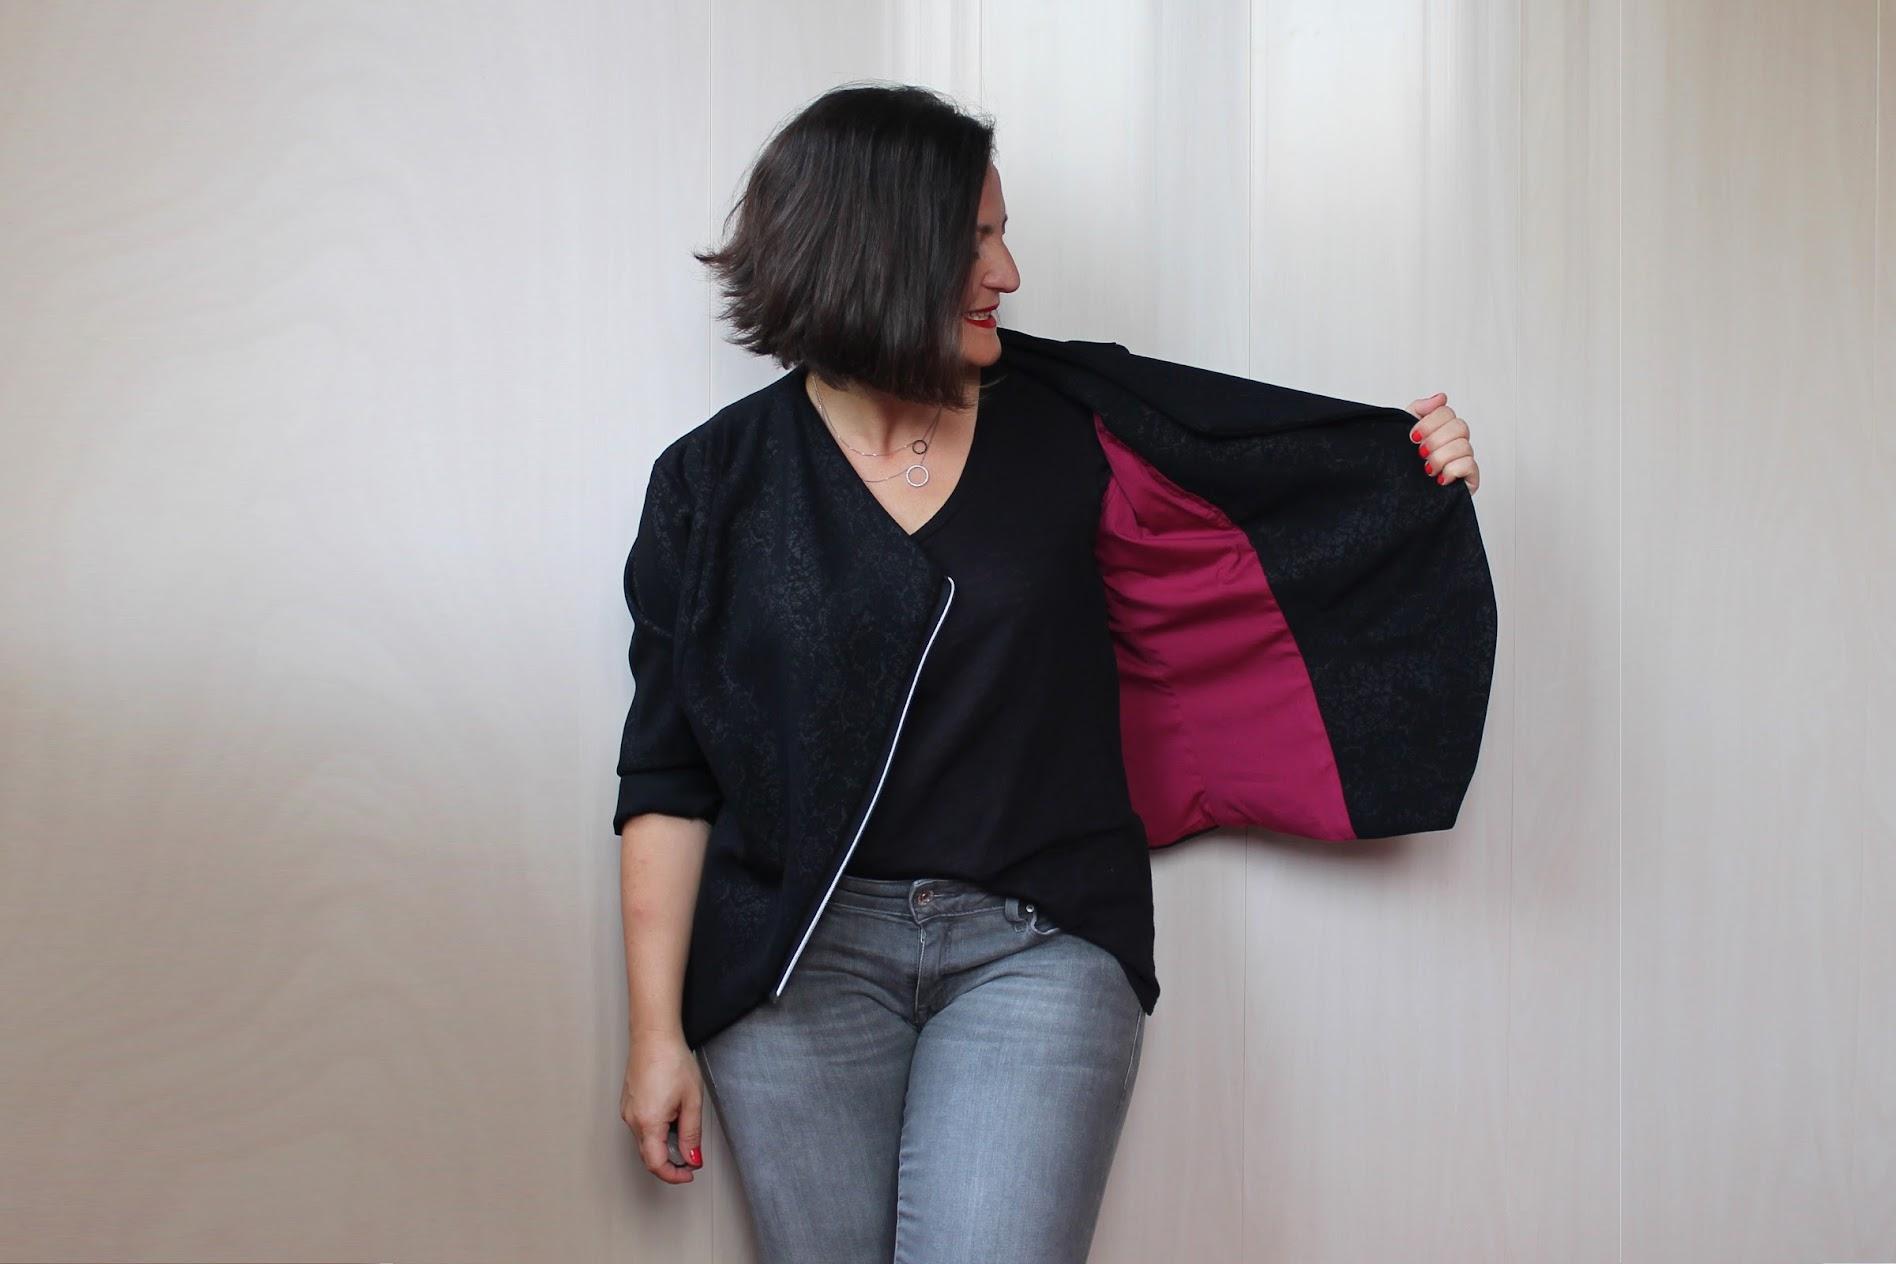 renkli astar, ceket dikişi, dikiş blog, kendin dik